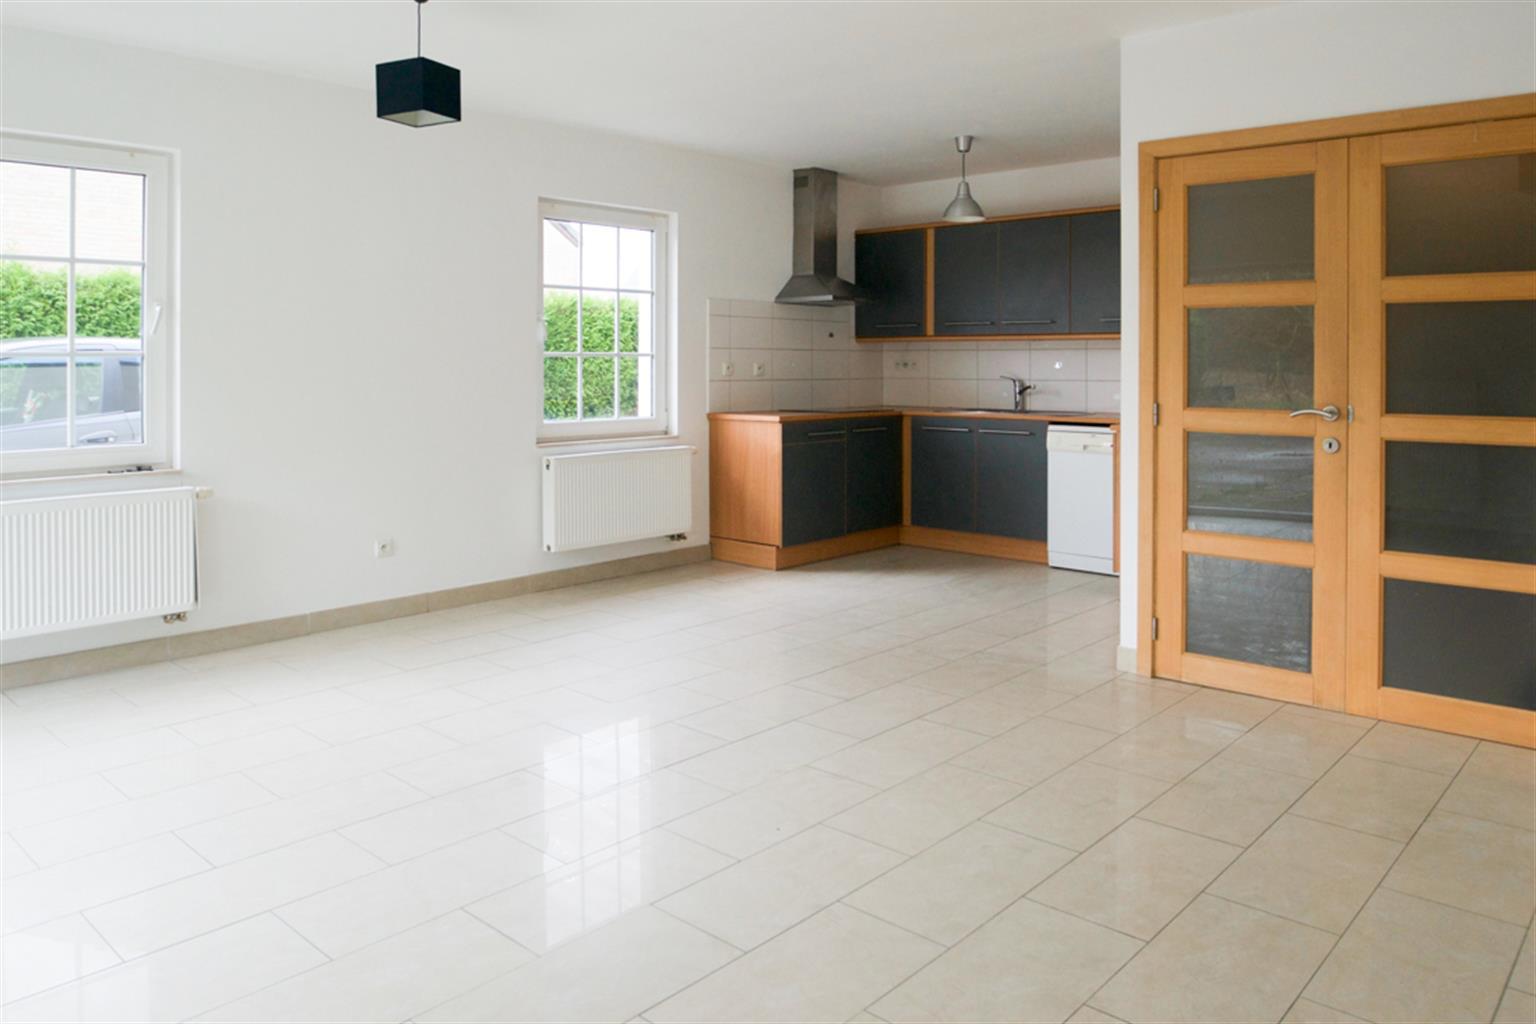 Appartement - Binche Leval-Trahegnies - #3269650-1